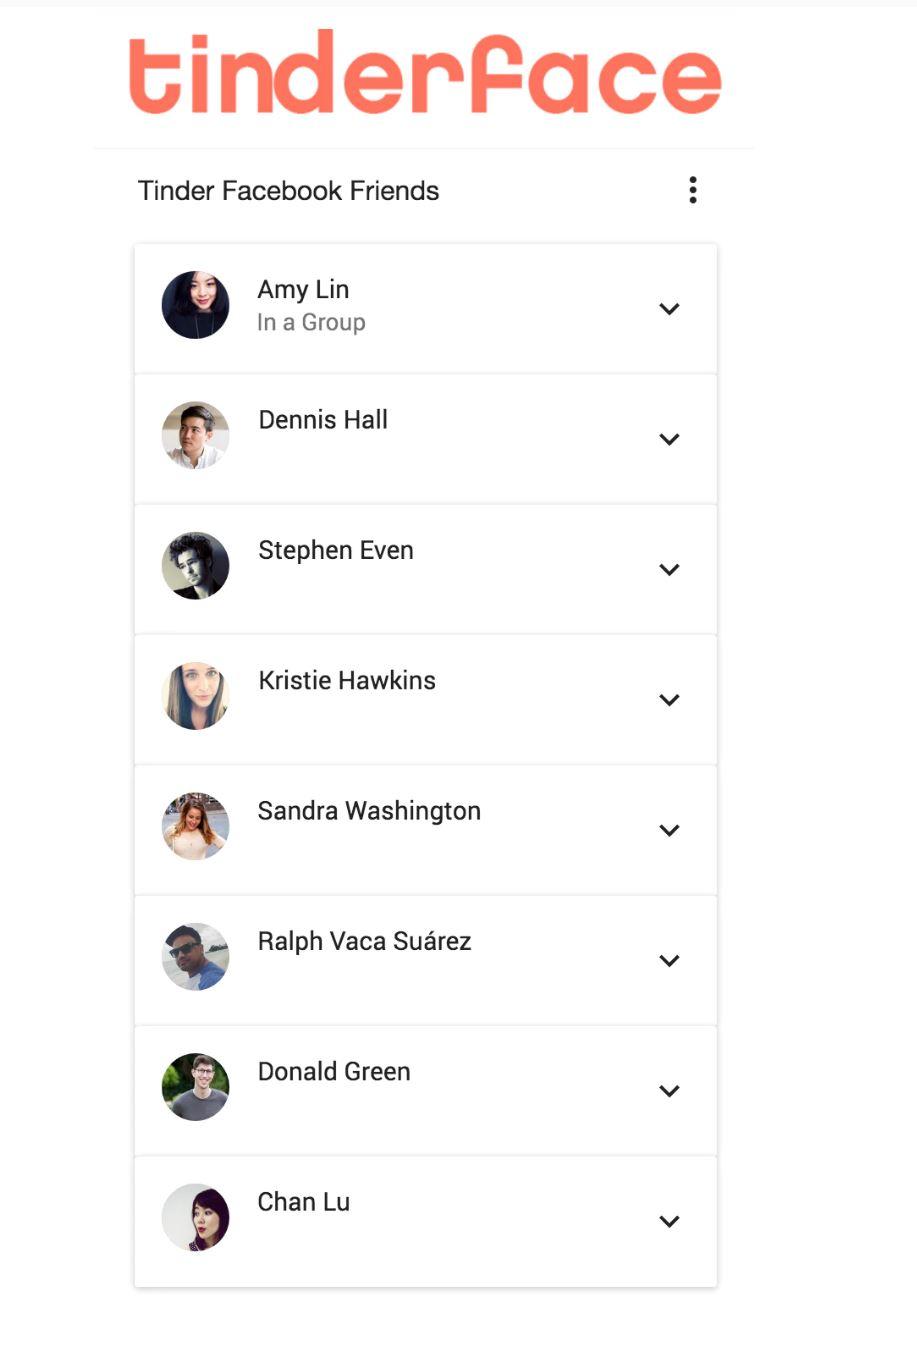 Liste der Dating-Profil-Benutzernamen Flo progressive Dating